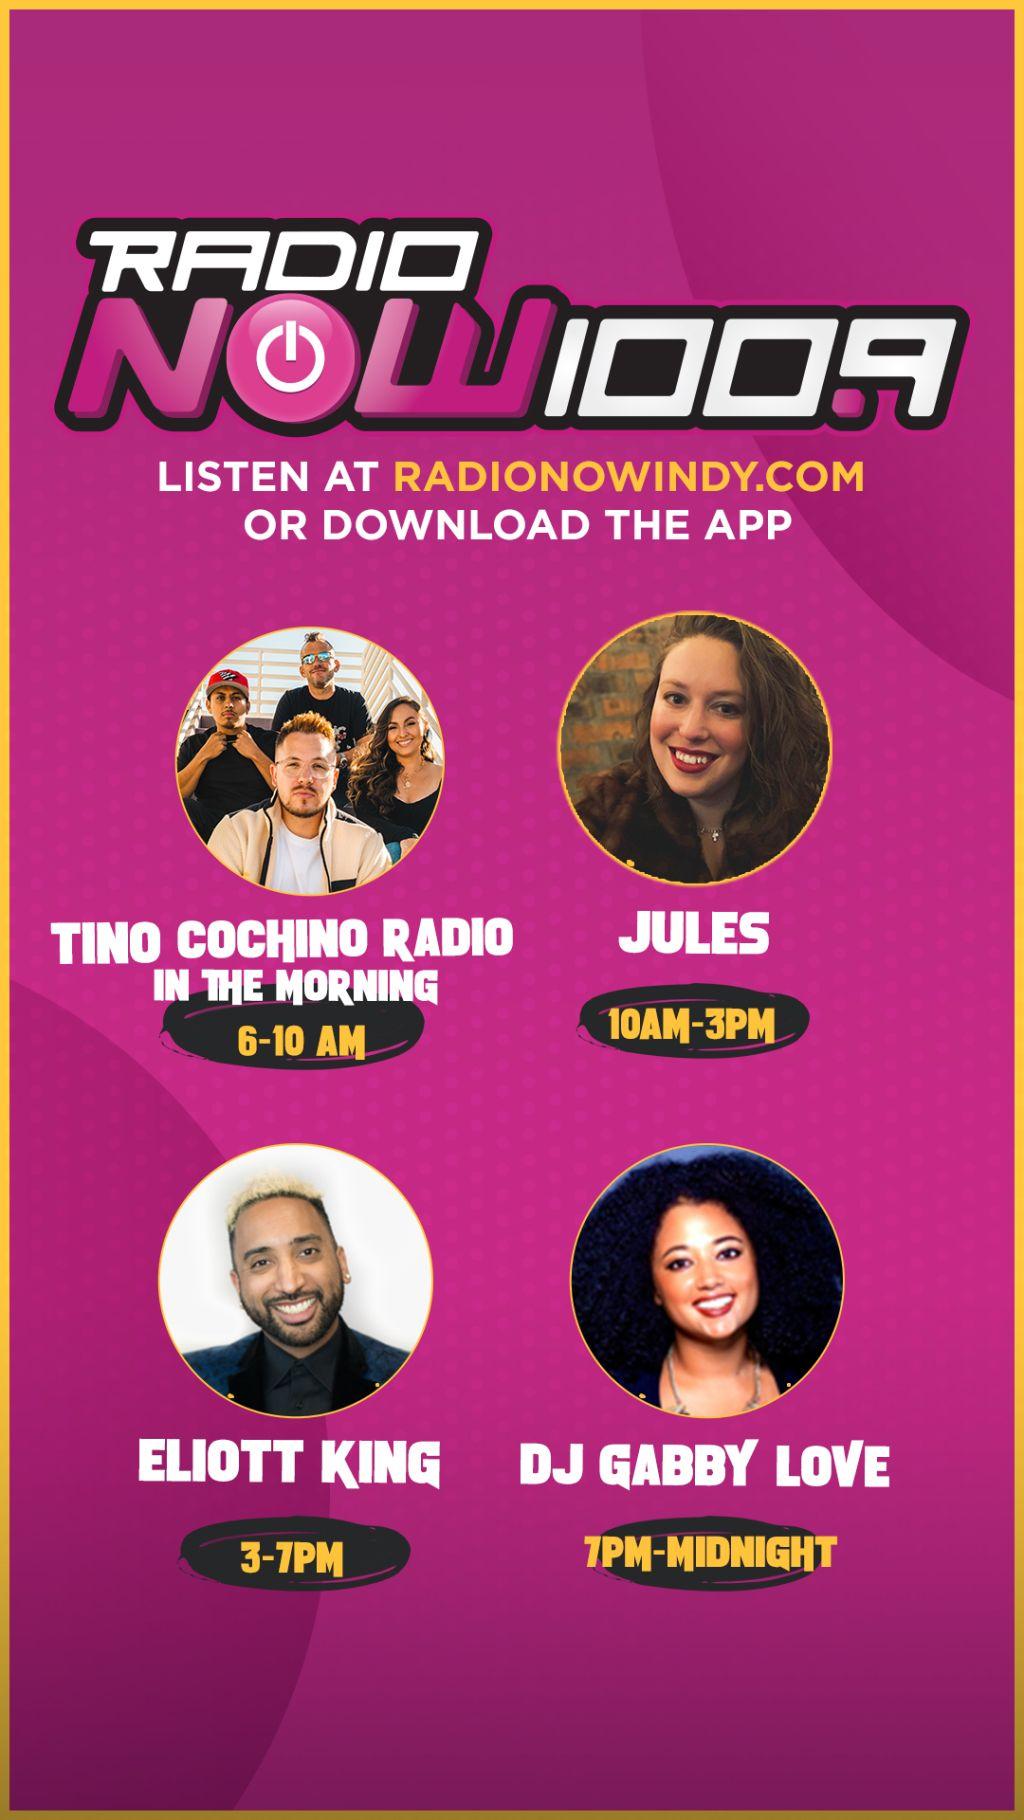 RadioNow New Lineup Branding